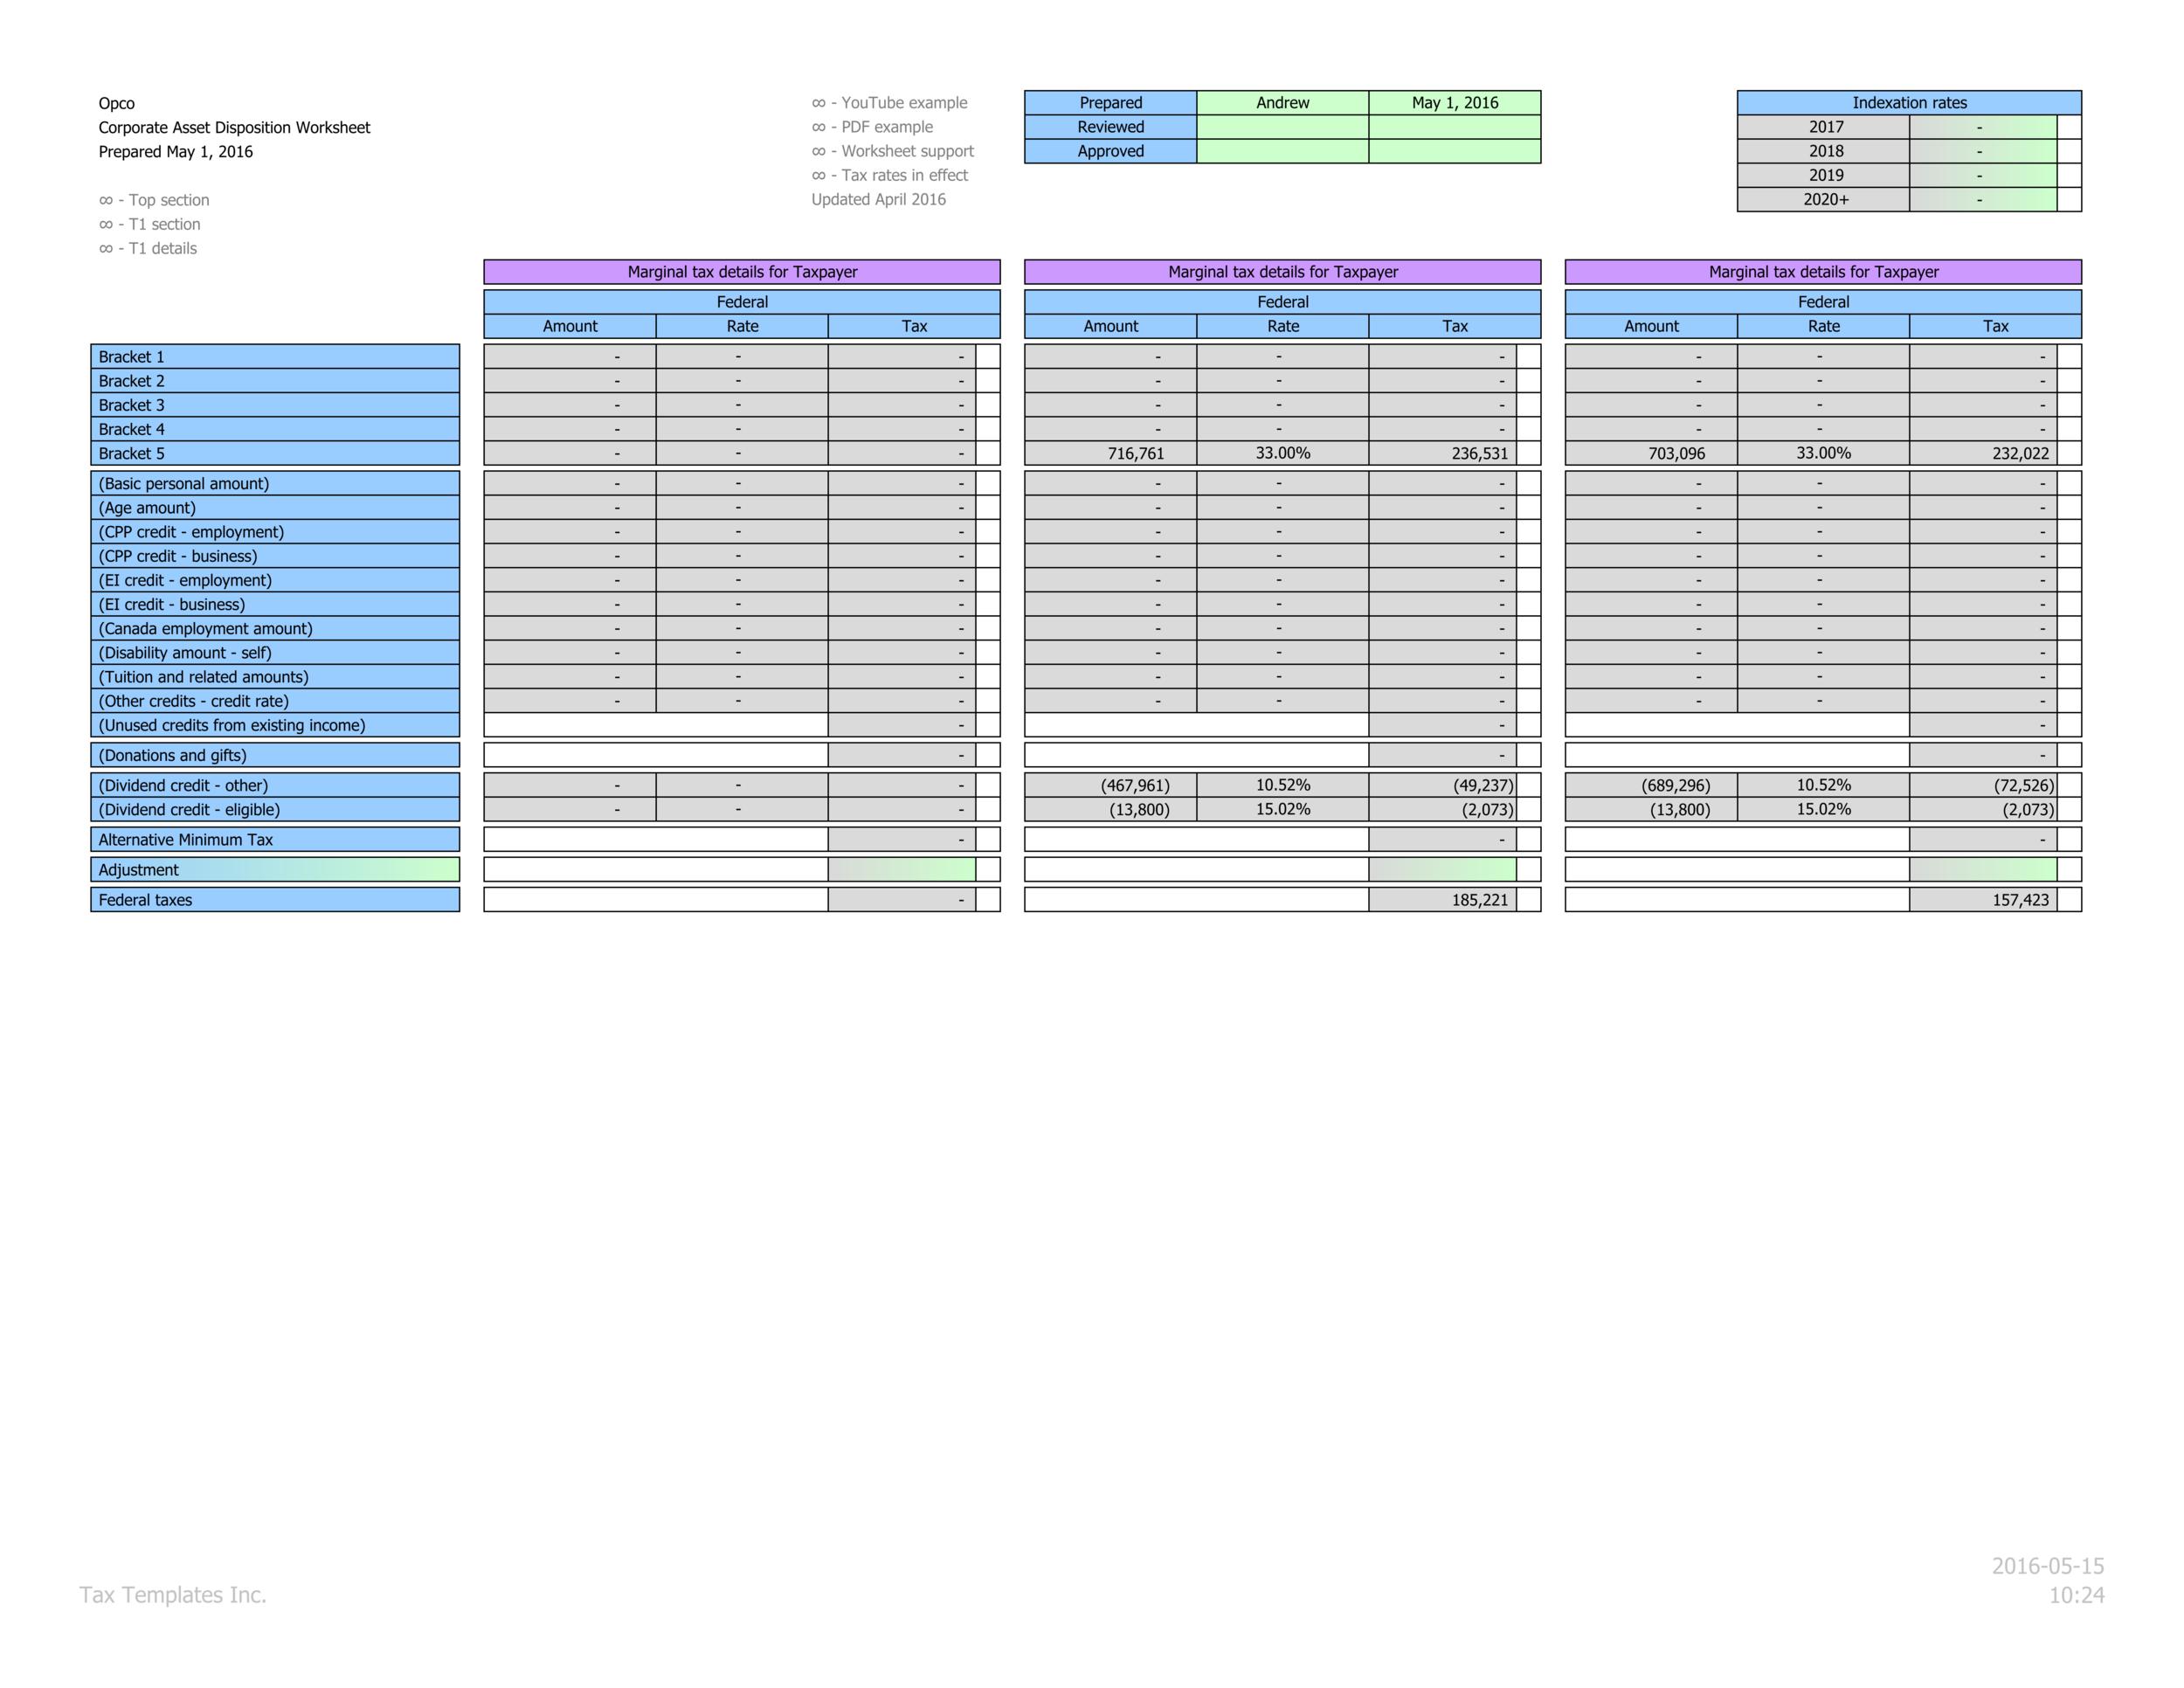 Marginal personal federal tax calculations